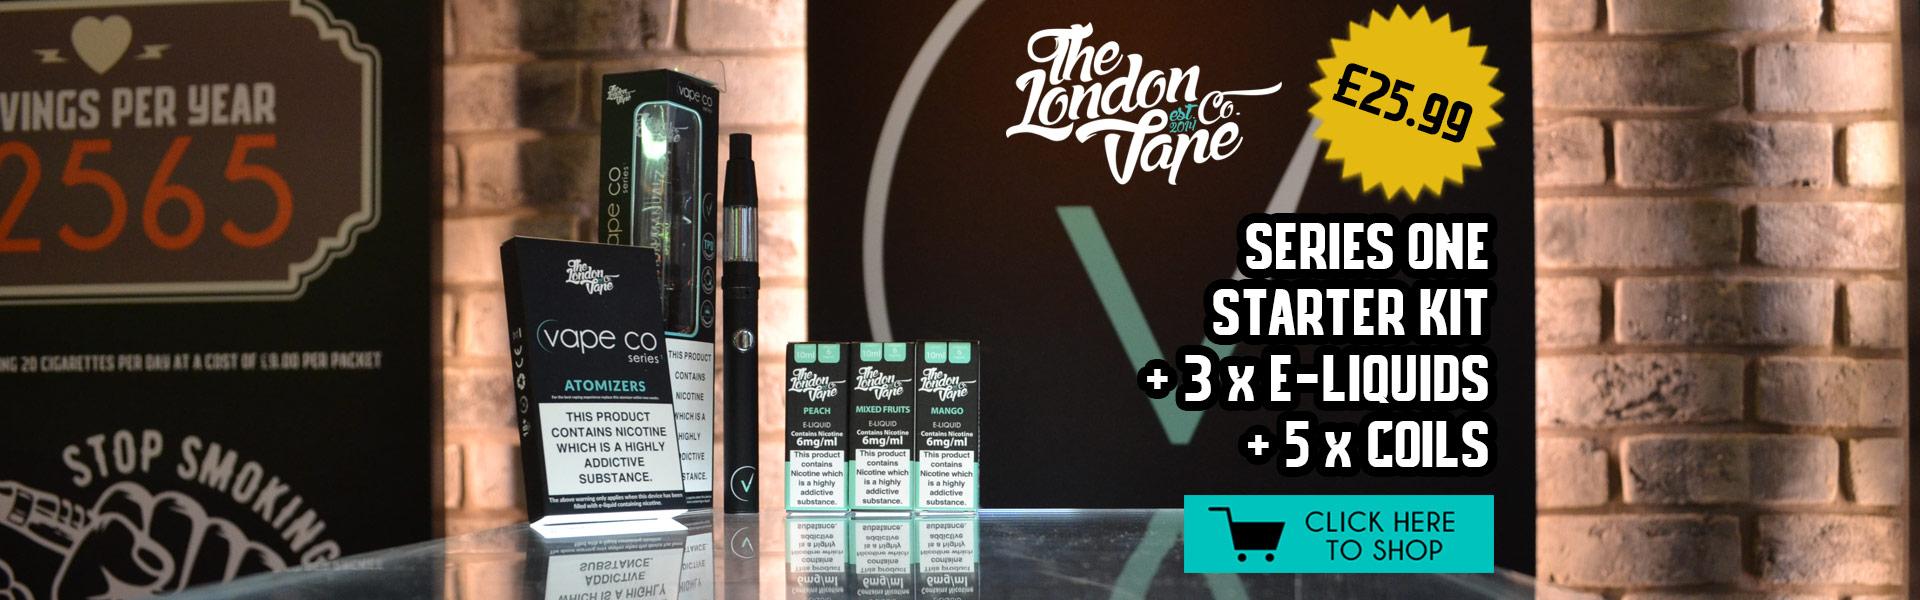 E cigarette UK - The London Vape Co, E liquids, London - E-liquid